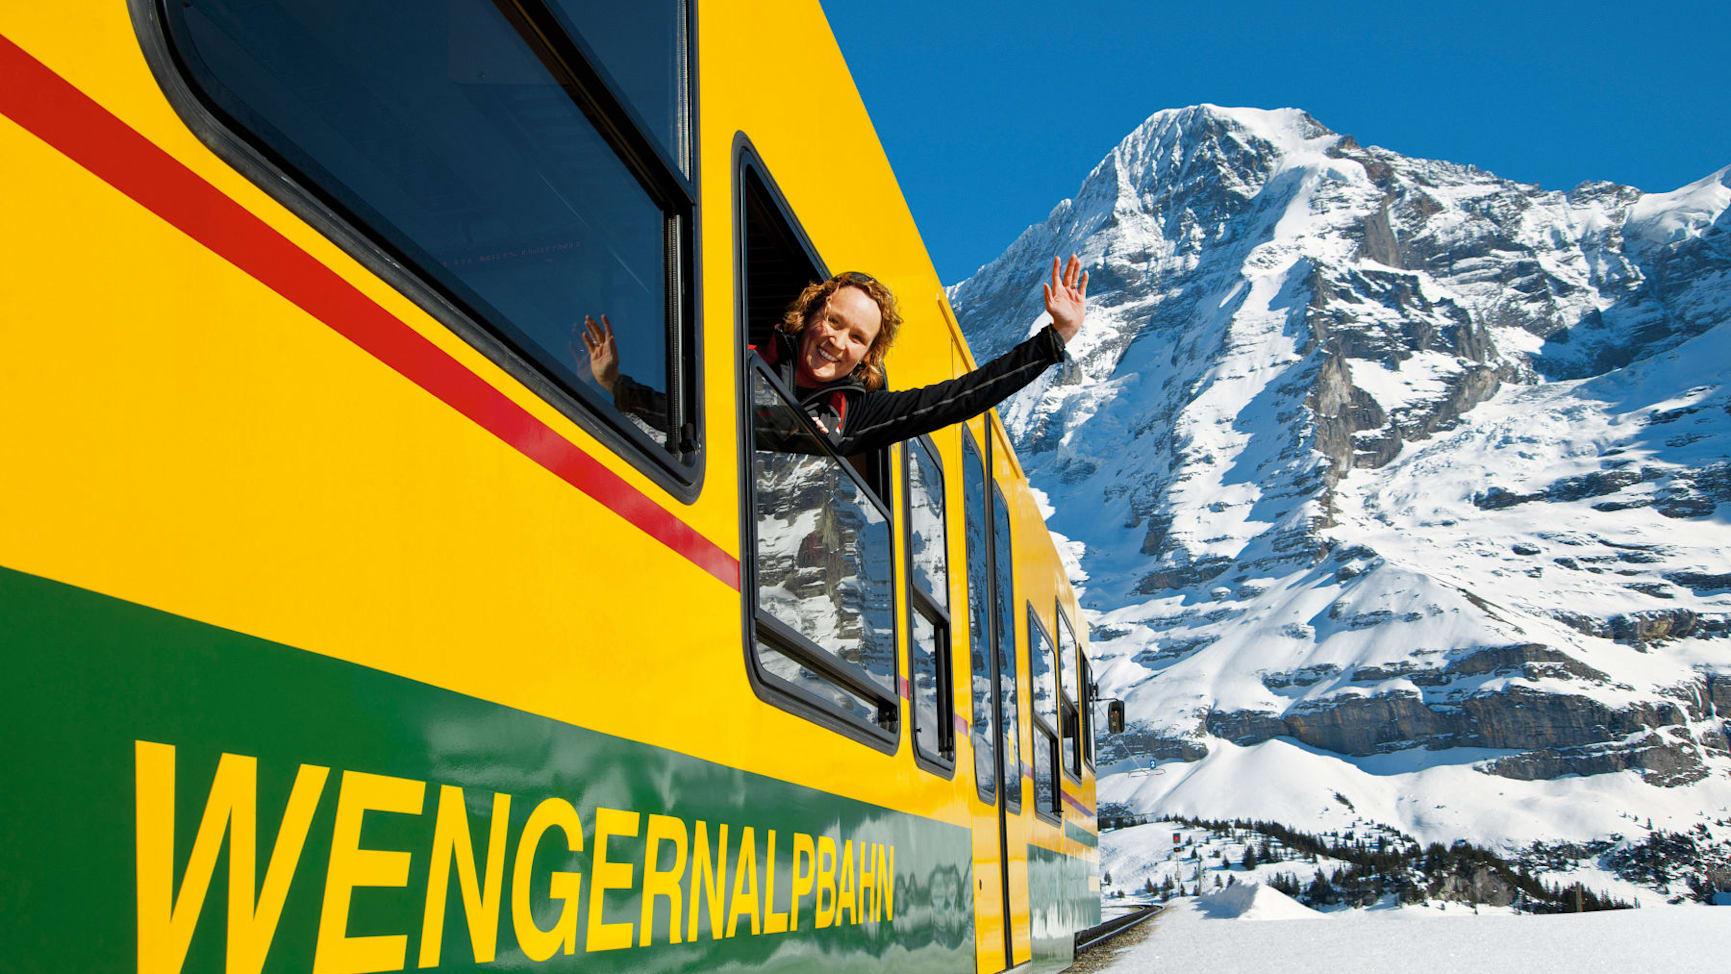 Wengernalpbahn winter 01